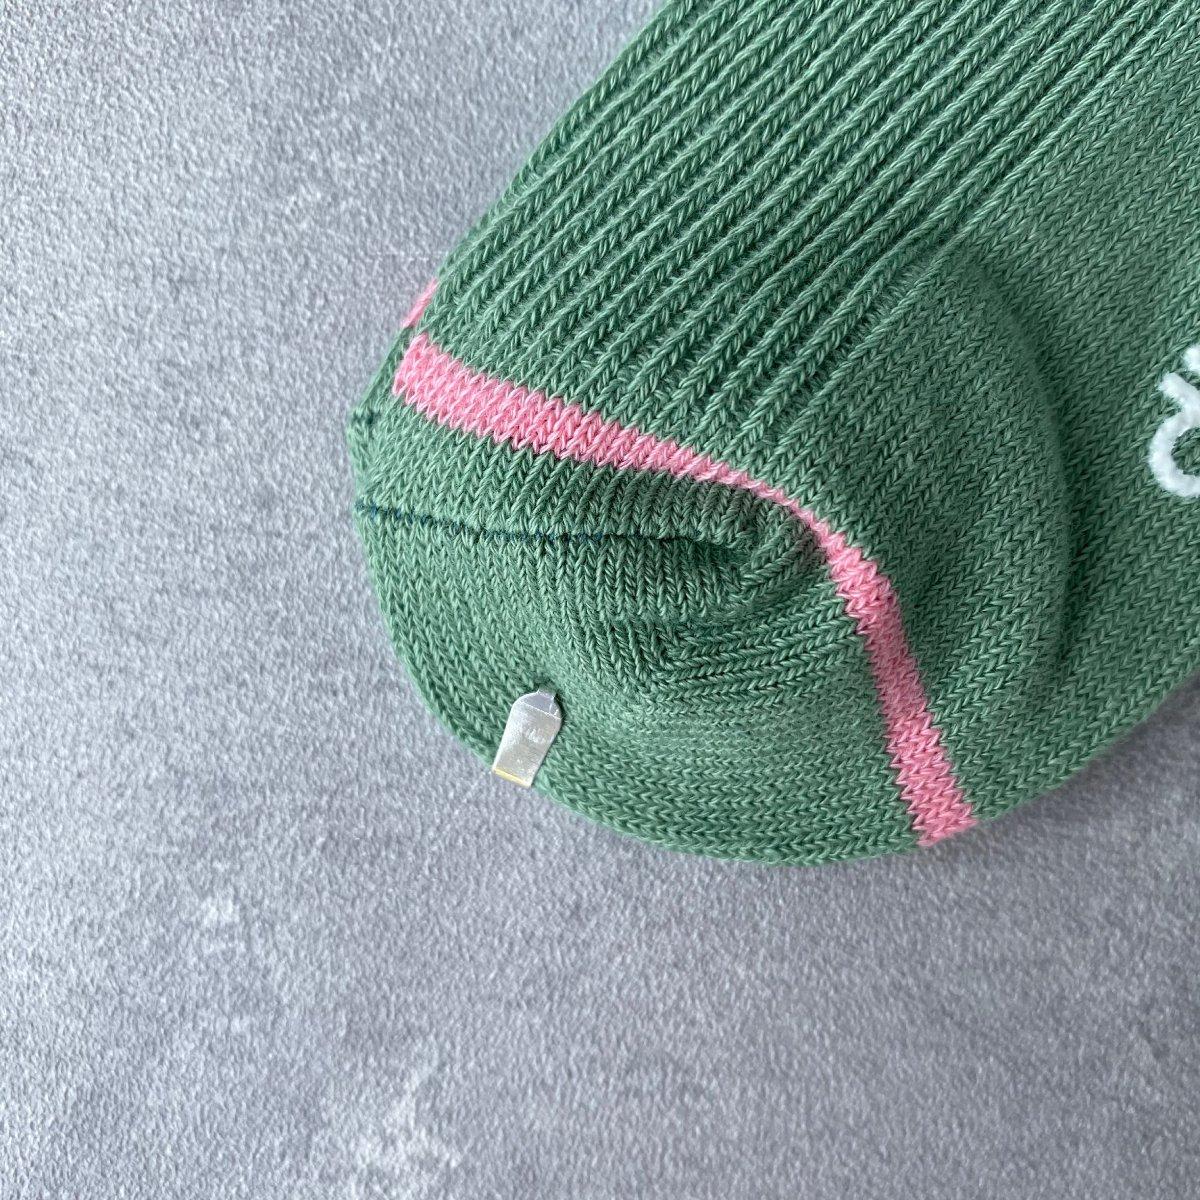 【KIDS】Dino Socks 詳細画像15